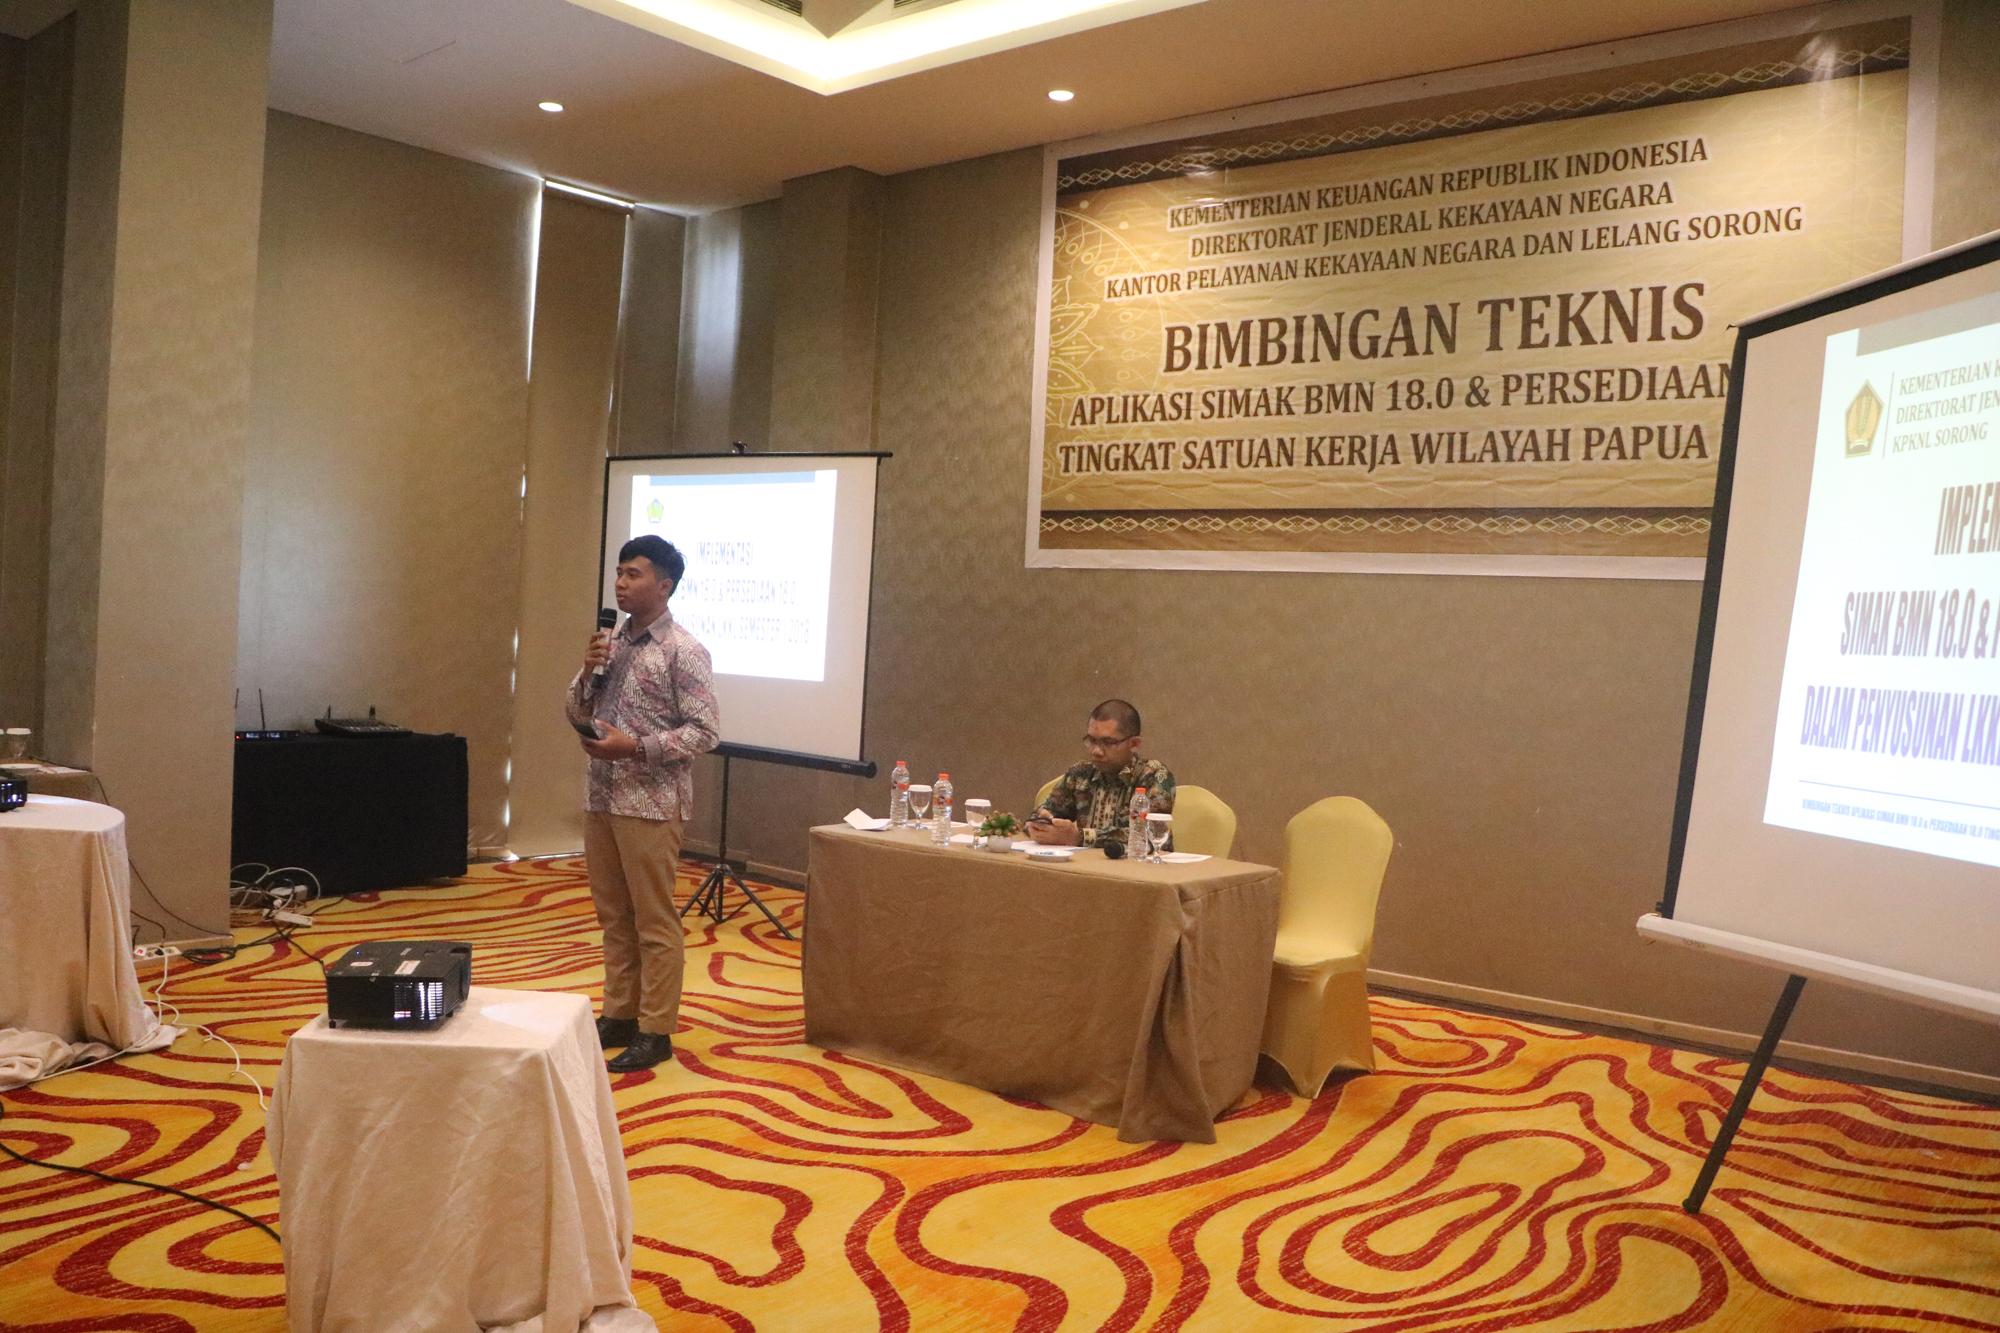 Bimbingan Teknis Aplikasi SIMAK BMN 18.0 dan Persediaan 18.0 Tingkat Satker Wilayah Papua Barat